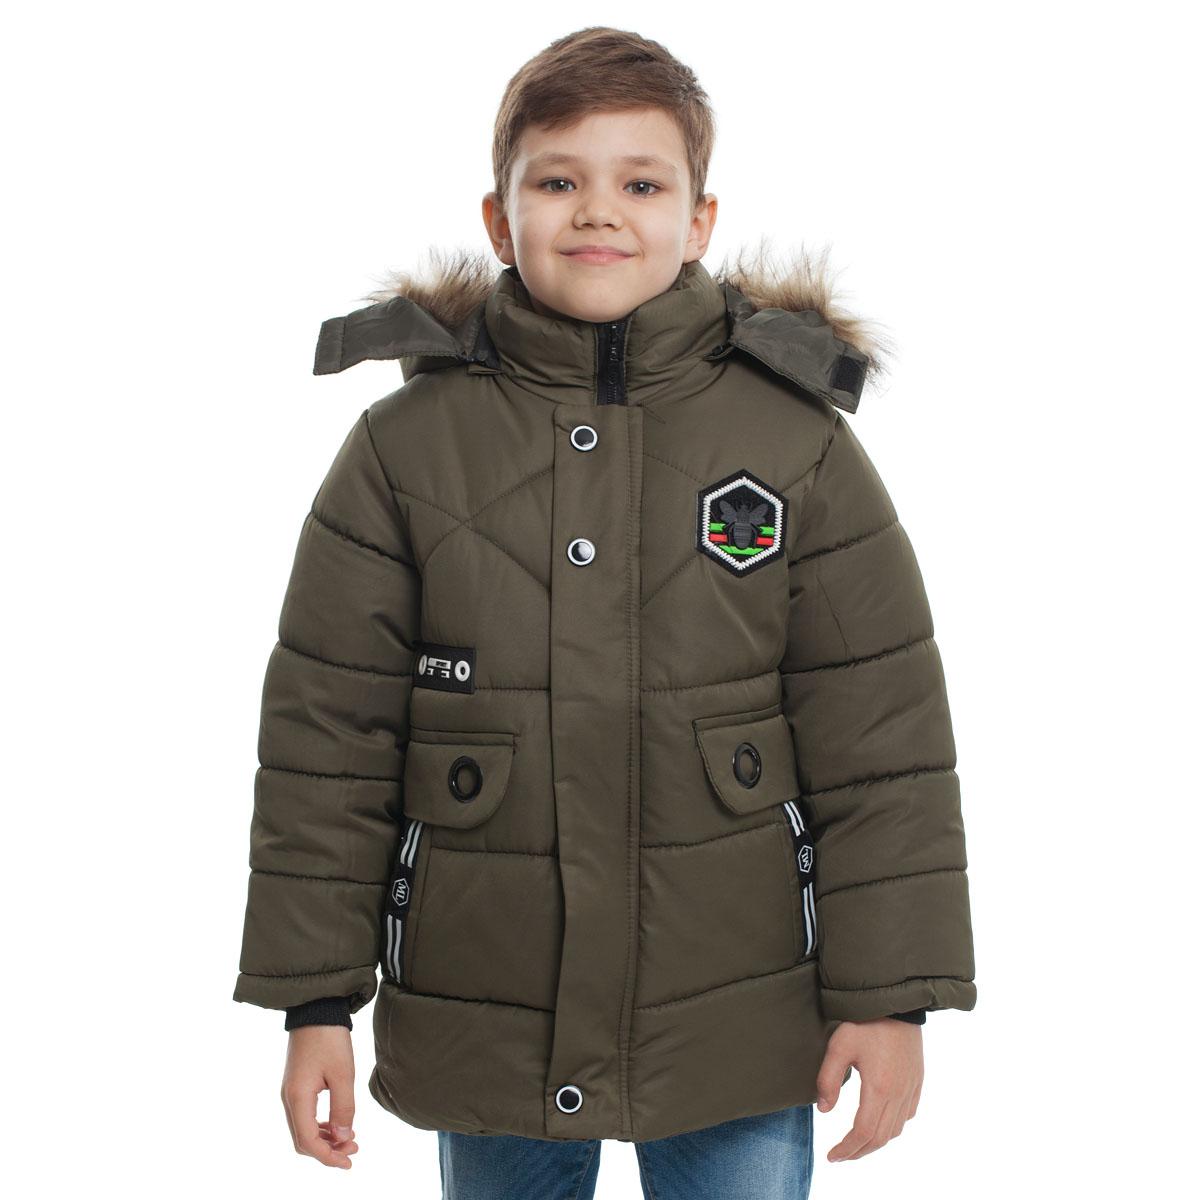 Куртка утепленная SPORT куртка утепленная bazioni bazioni mp002xm0qszm